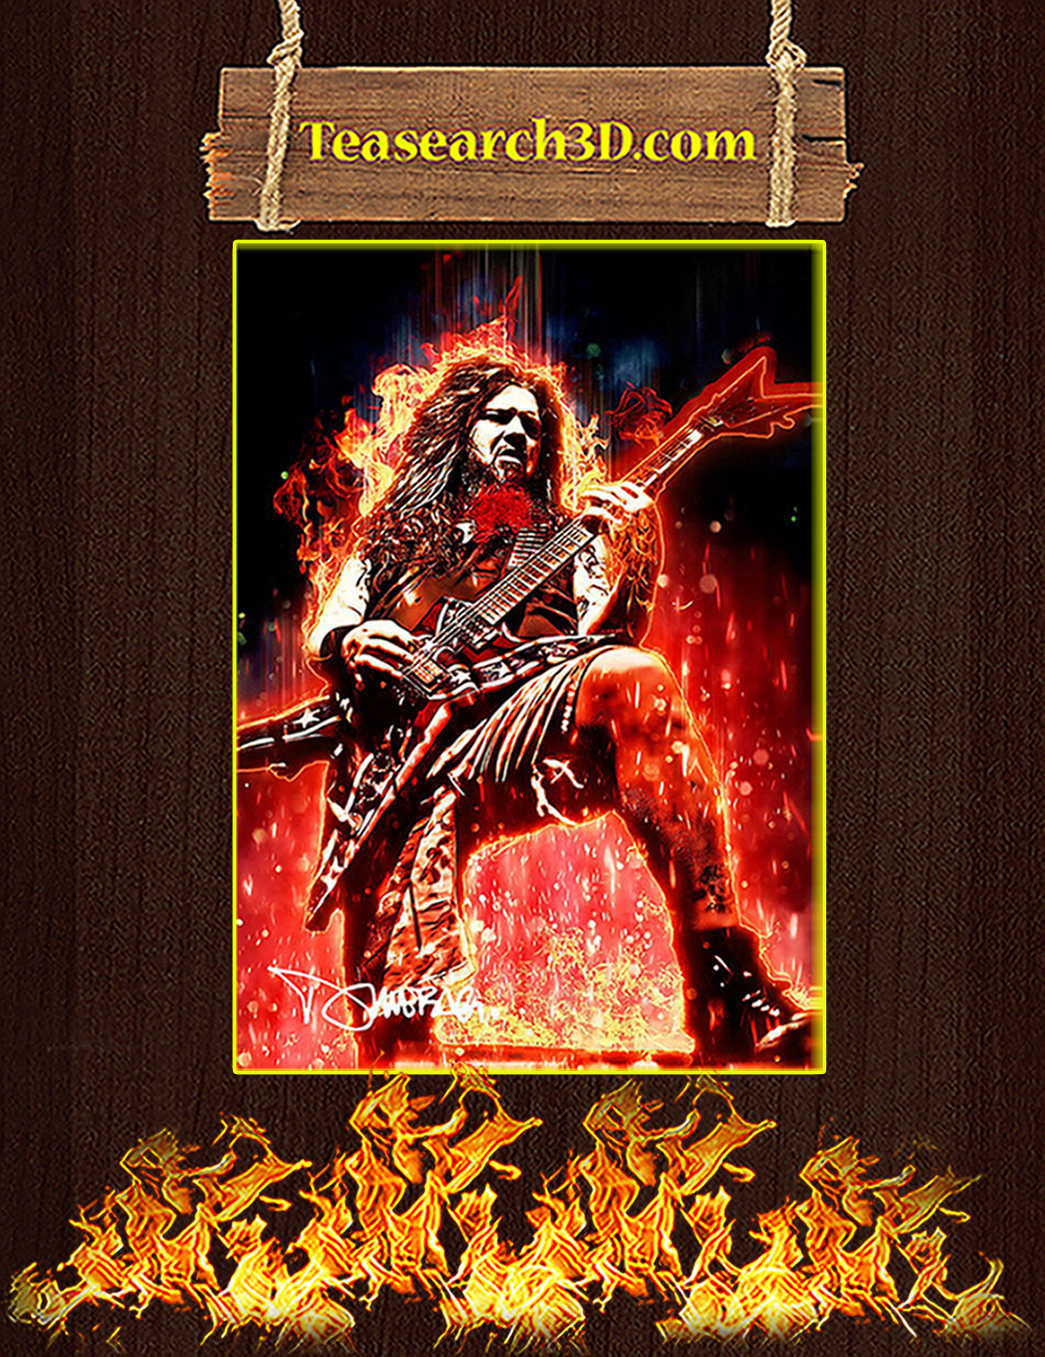 Legendary Dimebag Darrell Signature Poster A1